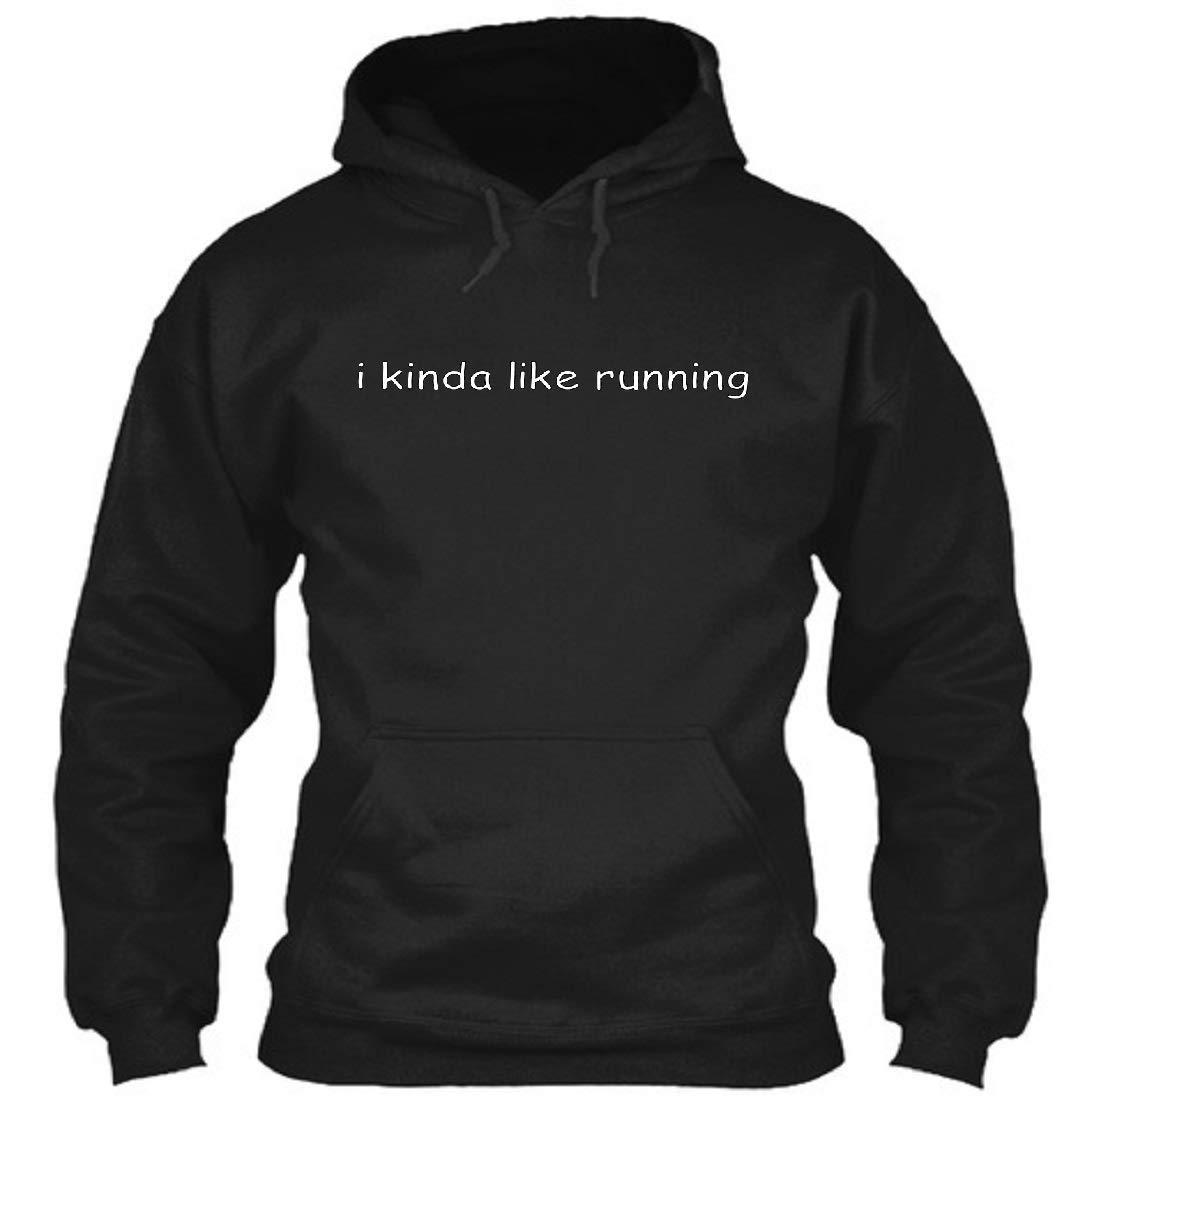 Al sold out. Funny Runners Austin Mall Sweatshirt I Kinda S-XL Running Like Sizes